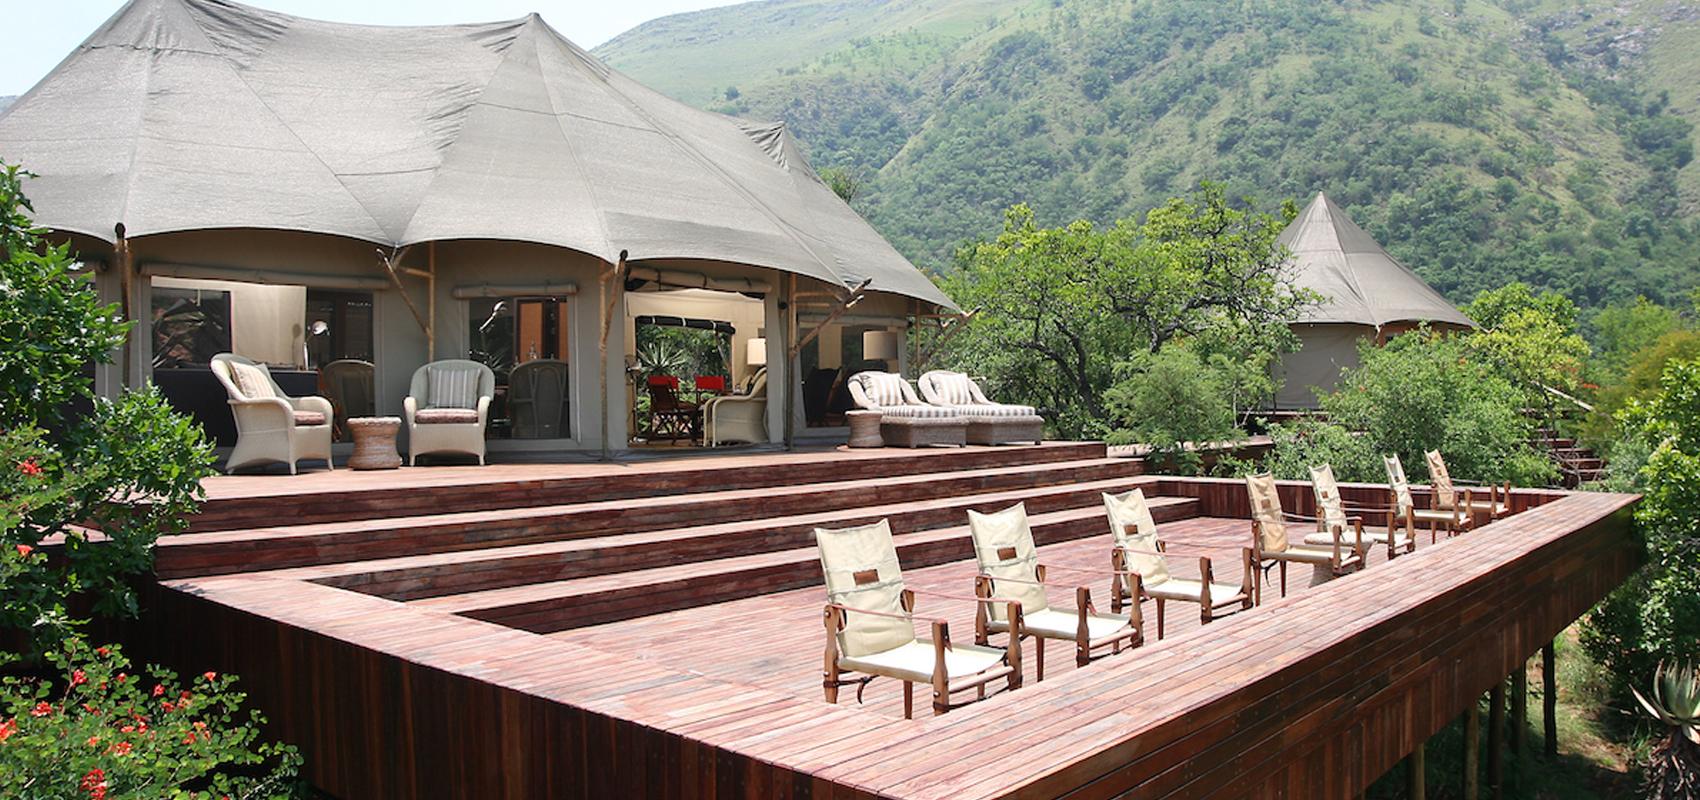 Nkomazi_Private_Game_Reserve-Tent_Repairs